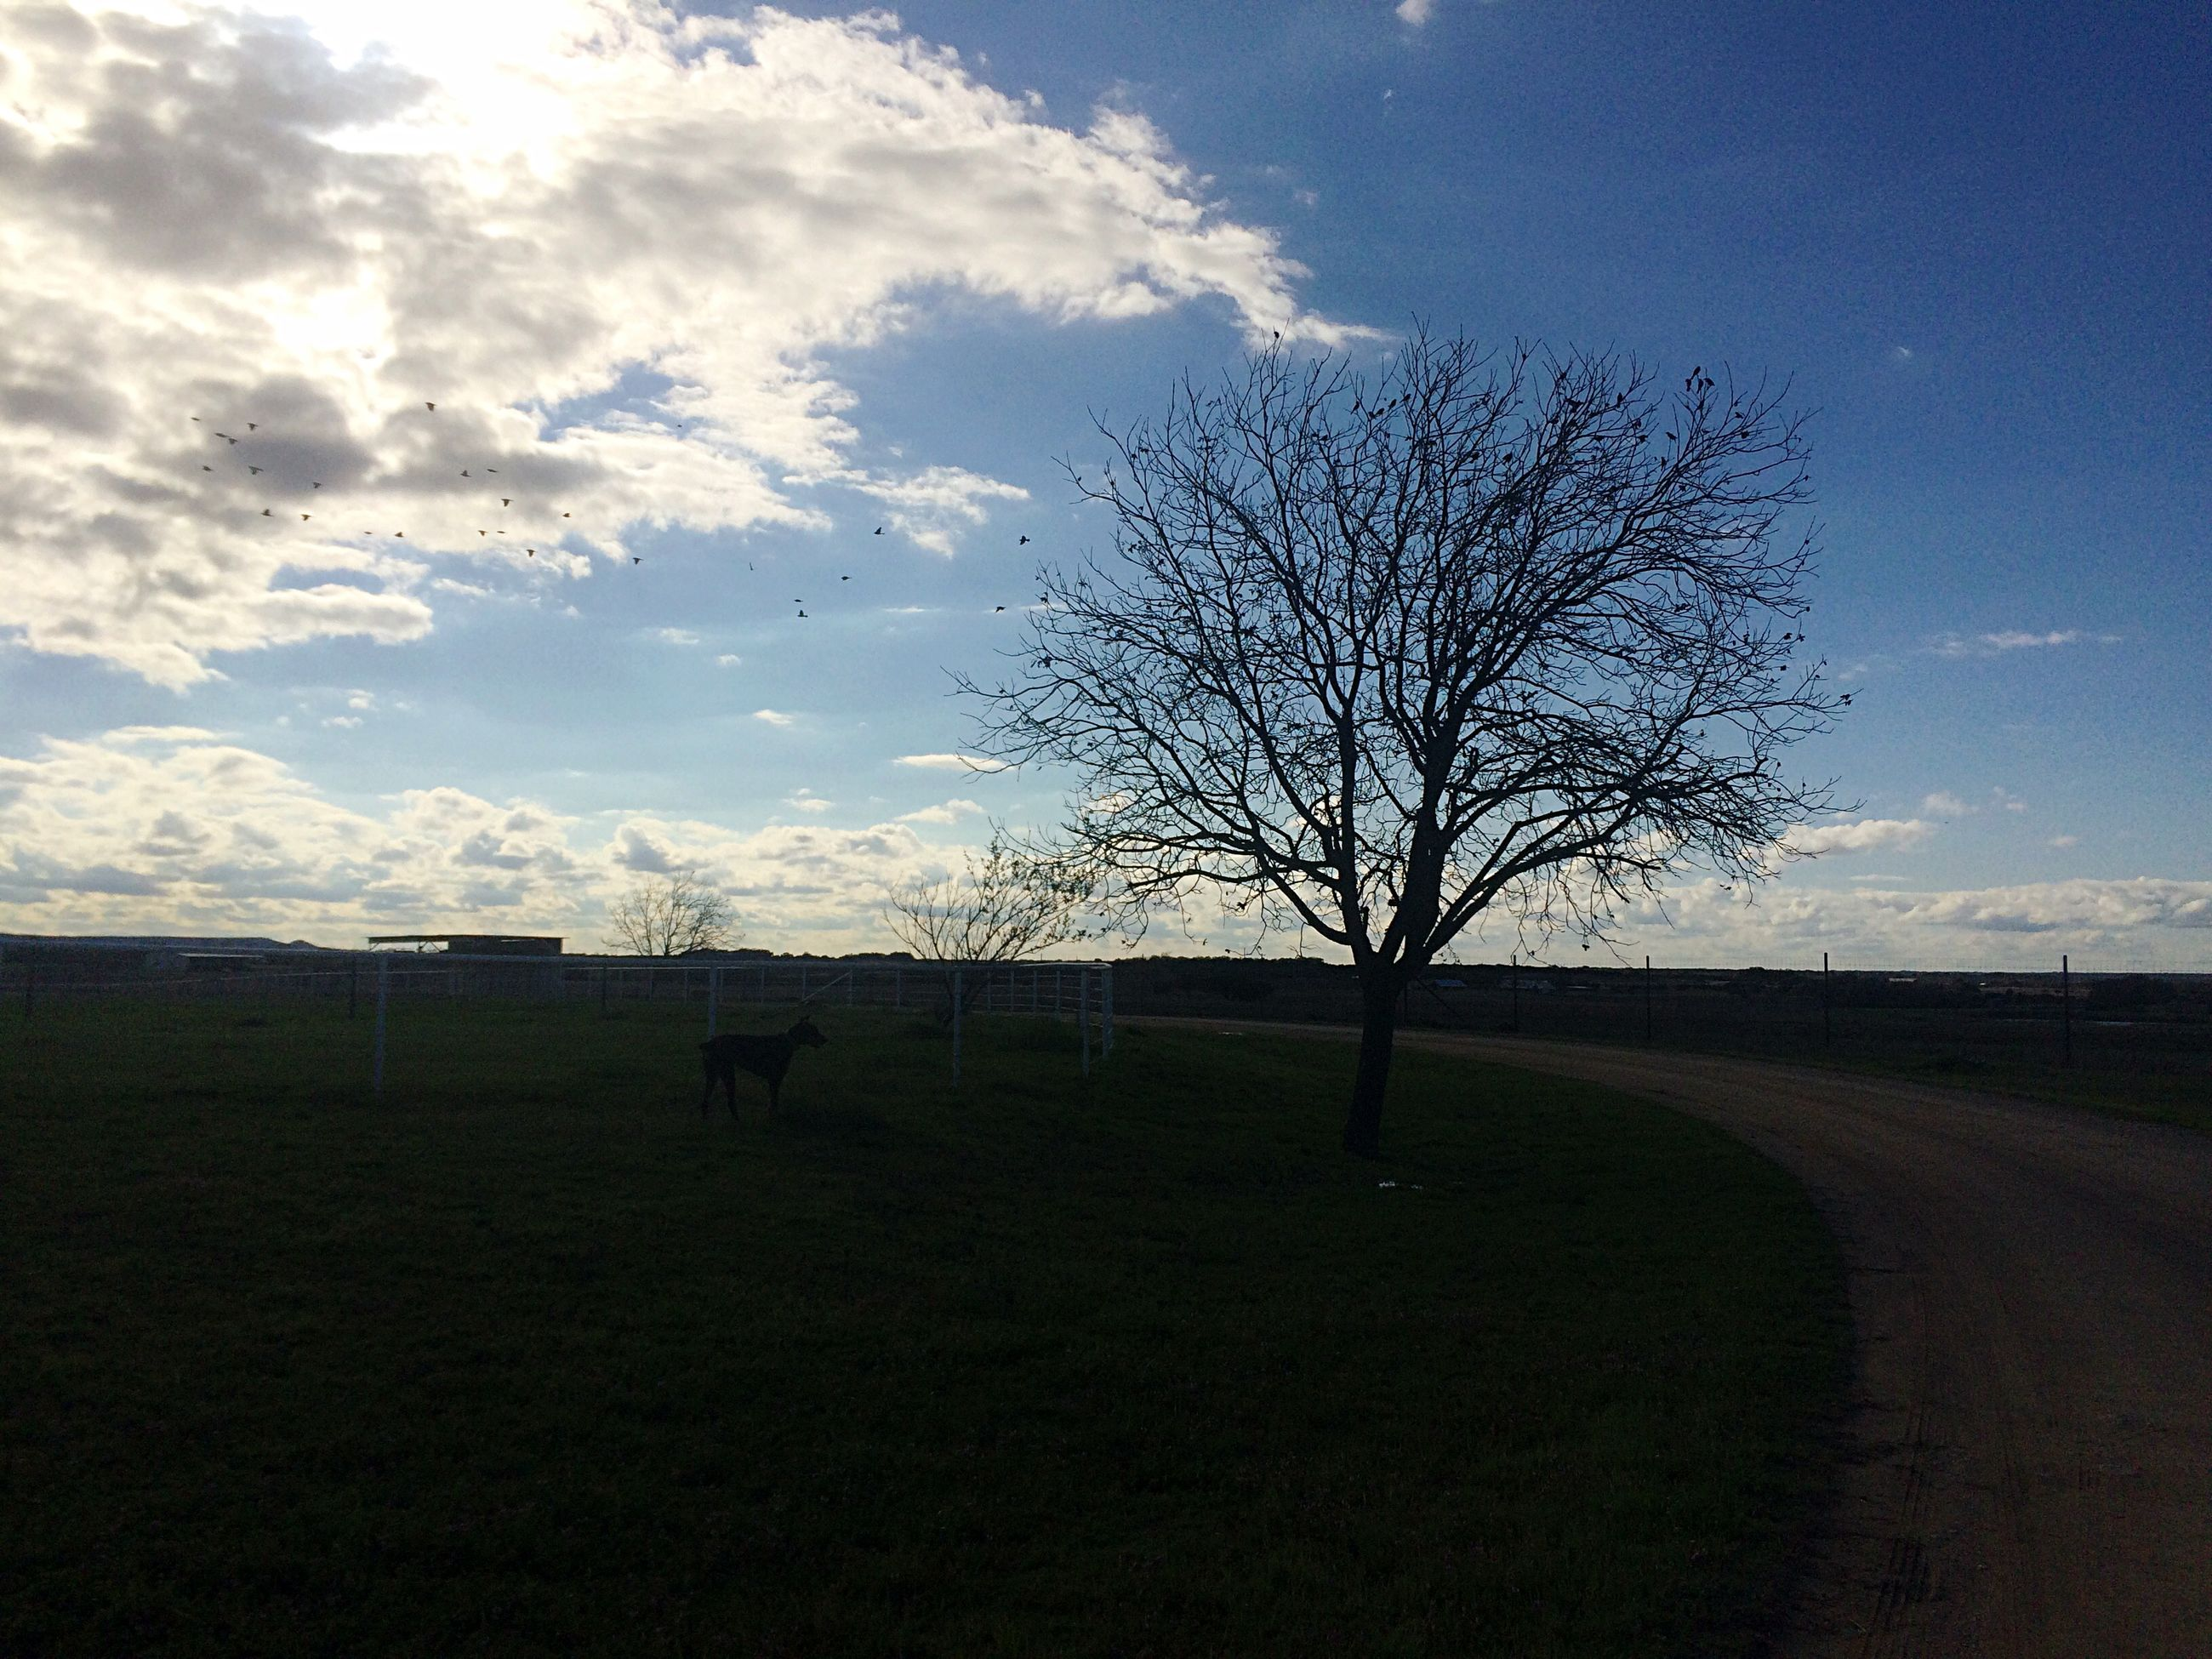 bare tree, tree, sky, tranquility, tranquil scene, landscape, field, scenics, beauty in nature, nature, branch, cloud - sky, silhouette, cloud, single tree, grass, non-urban scene, remote, solitude, no people